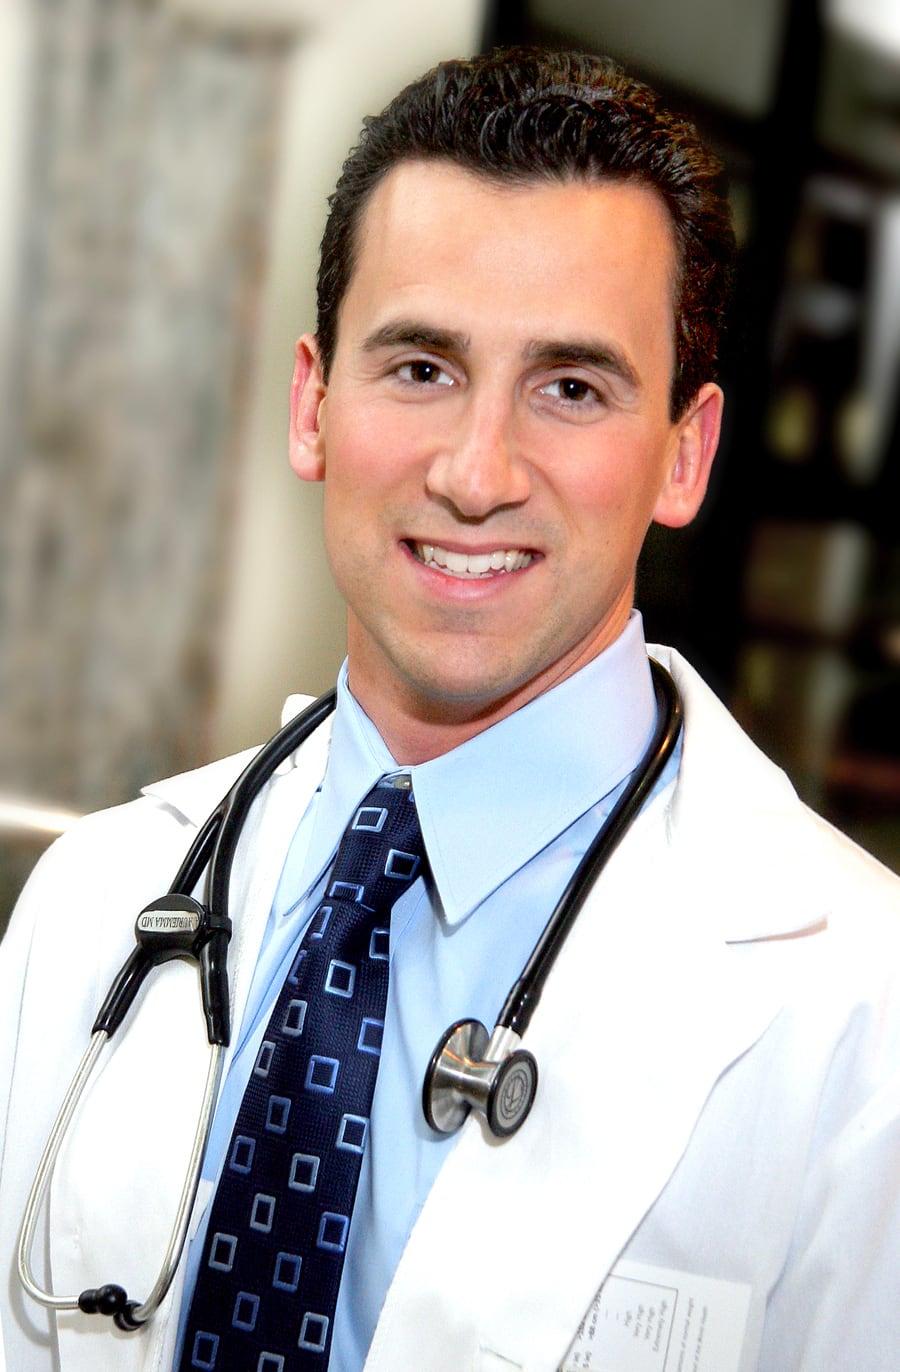 Dr. Anthony M Auriemma MD